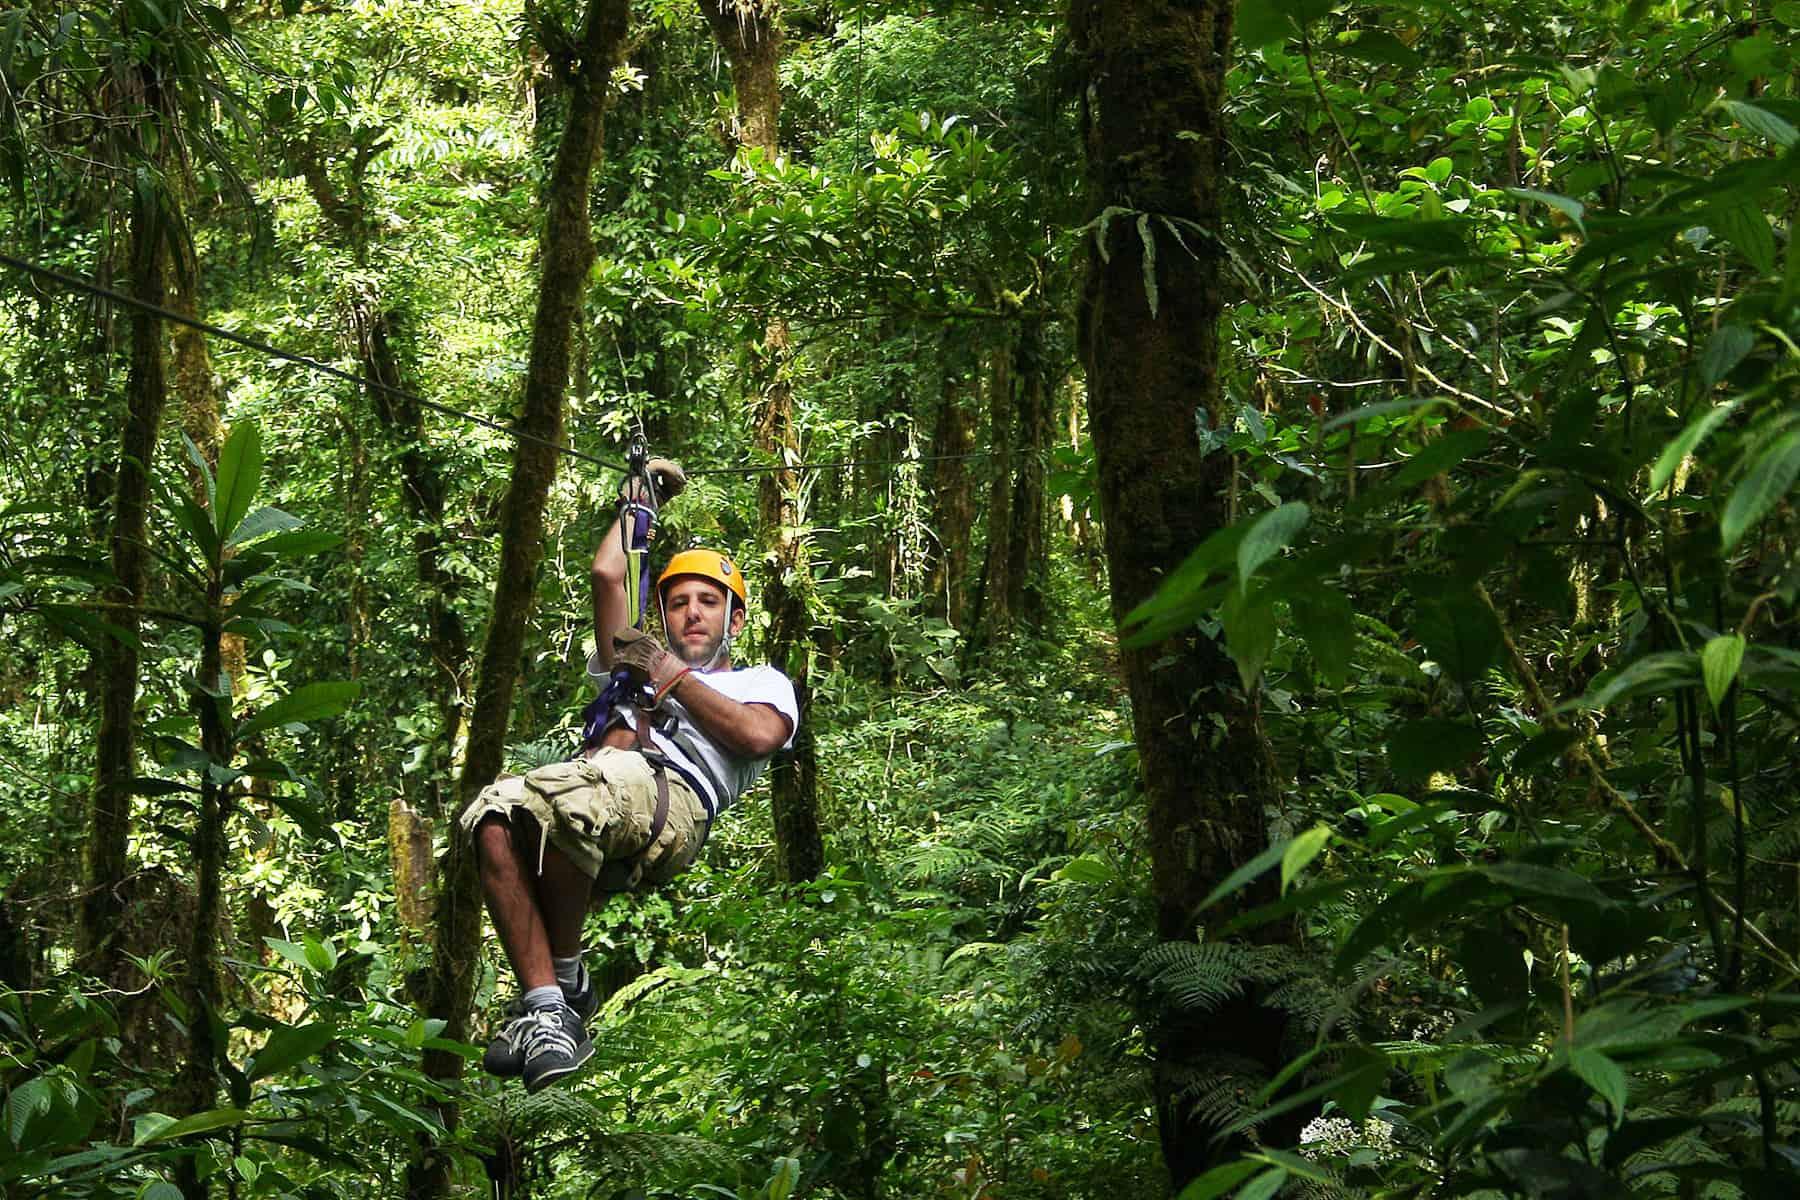 Canopy, ziplining in Costa Rica